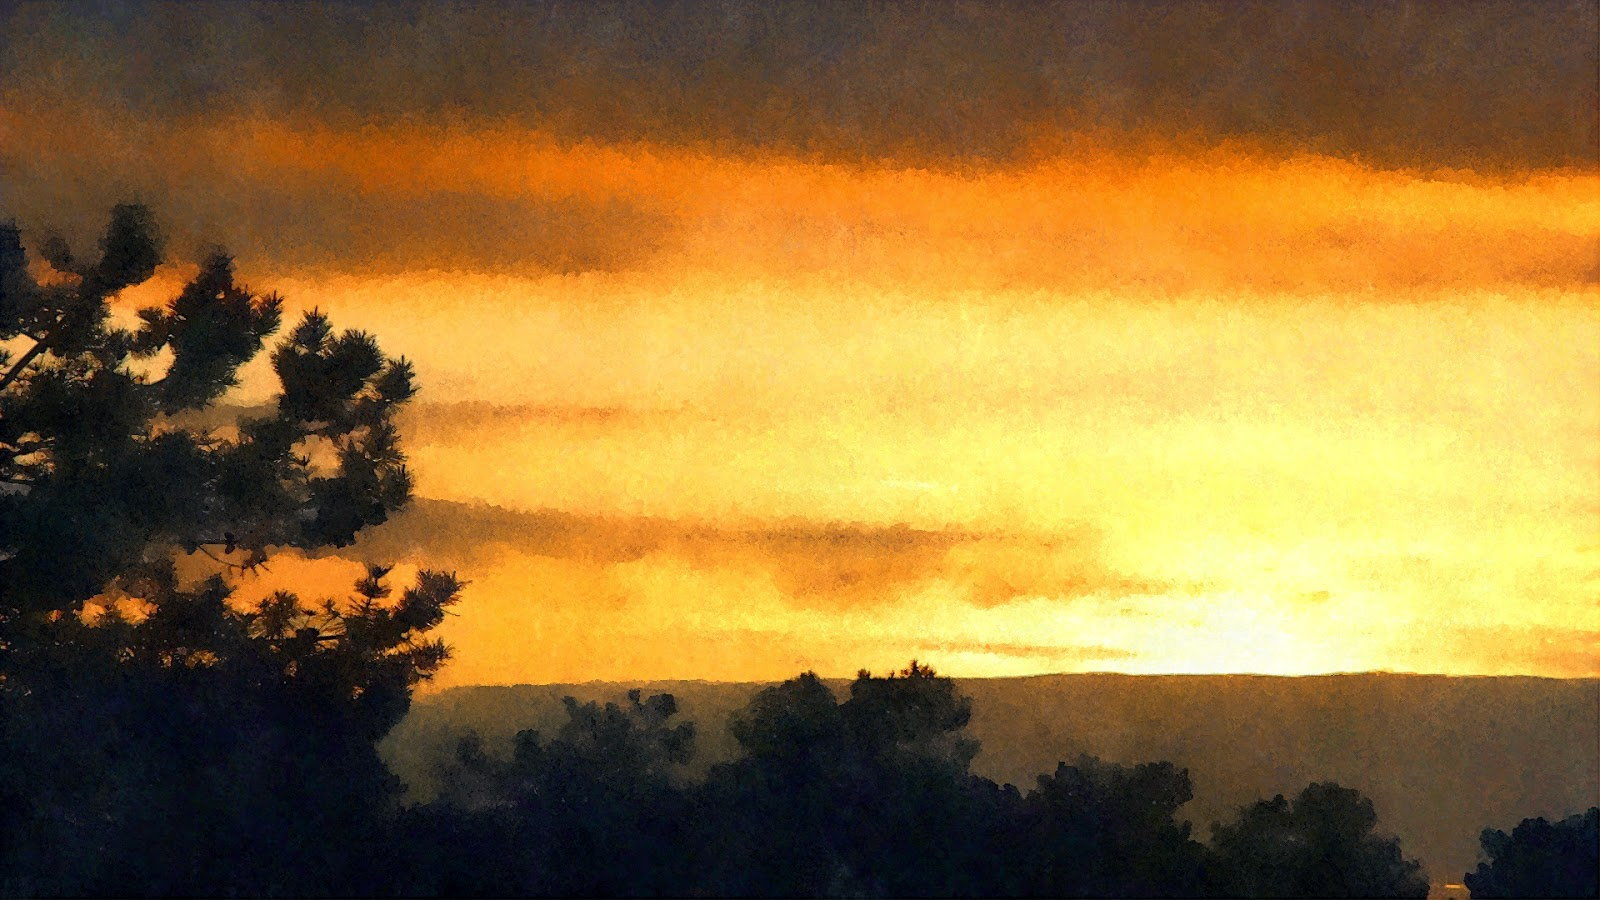 Pôr do Sol 28Feb15 (1920x1080)-FotoSketcher- pintura 1 aguarela